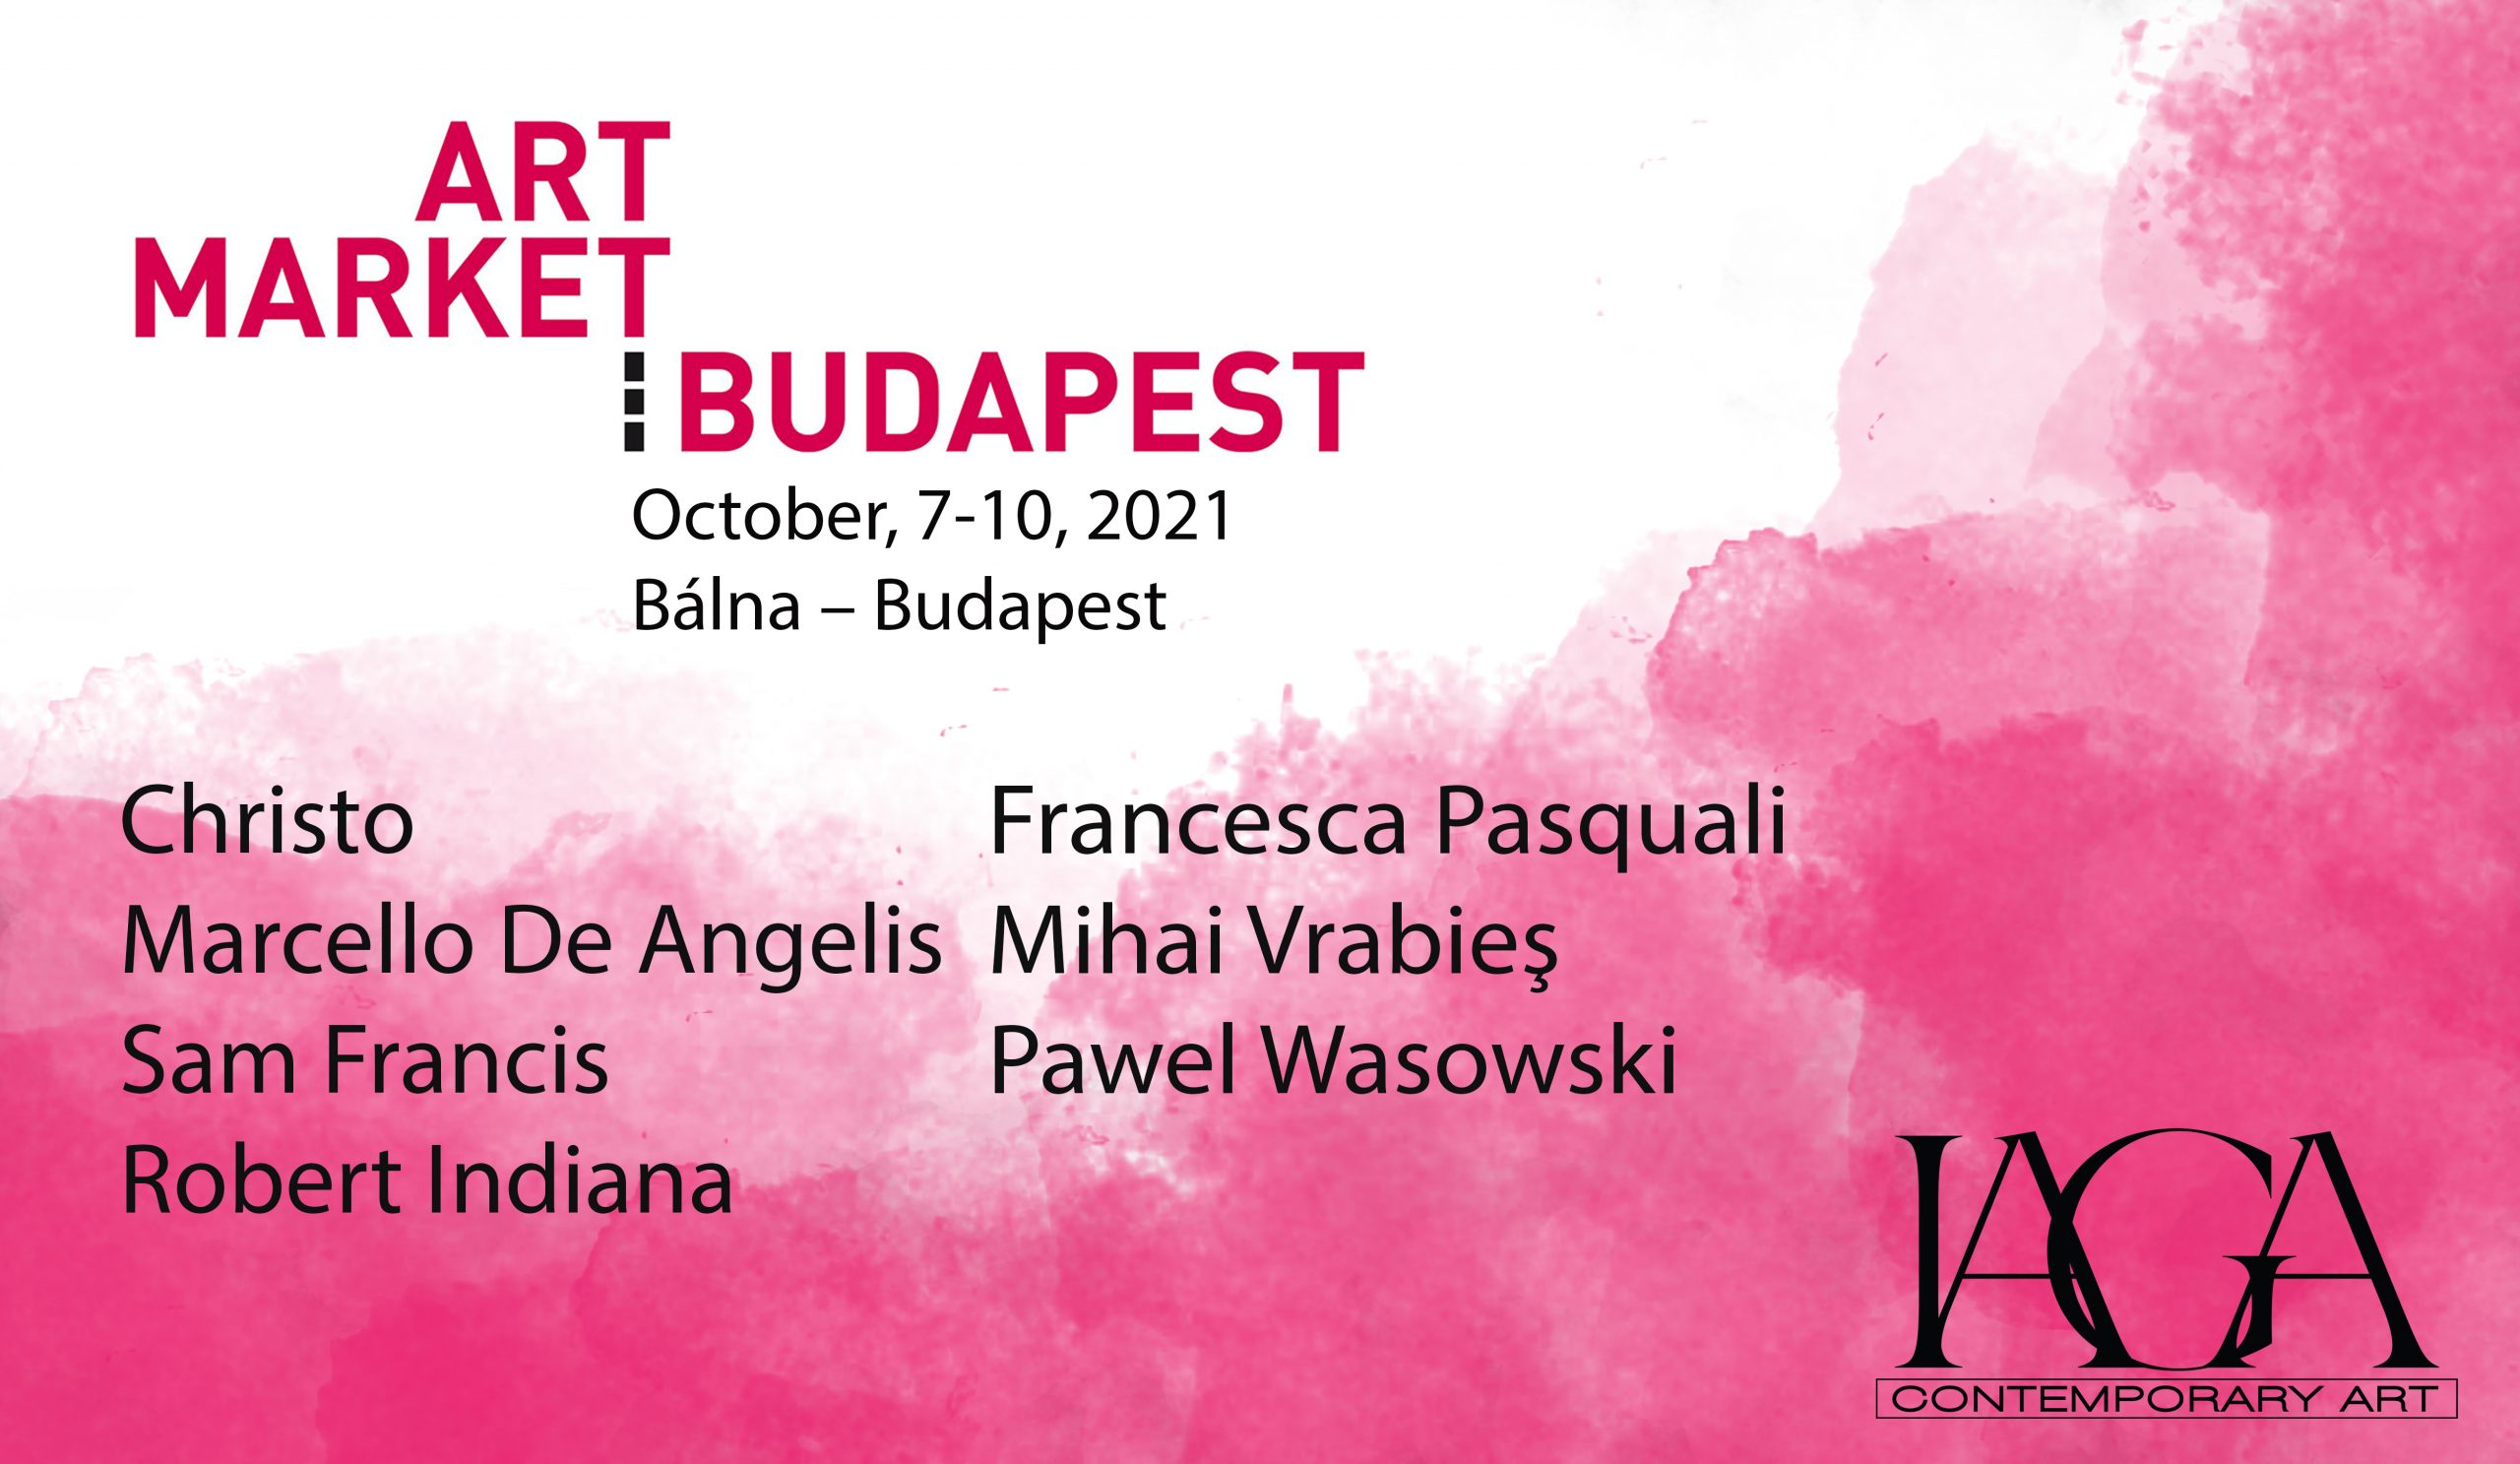 Art Market Budapest 2021